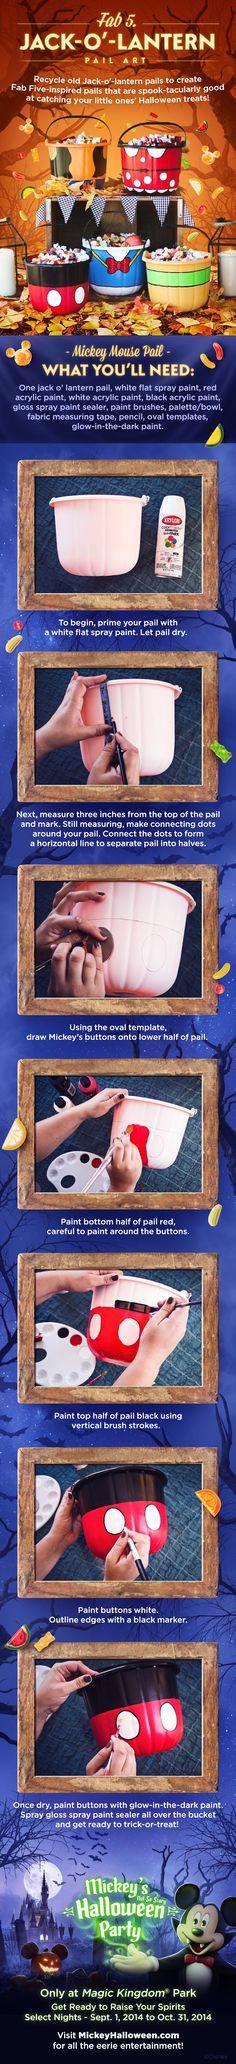 DIY Jack-o'-lantern Pail Art from Walt Disney World!